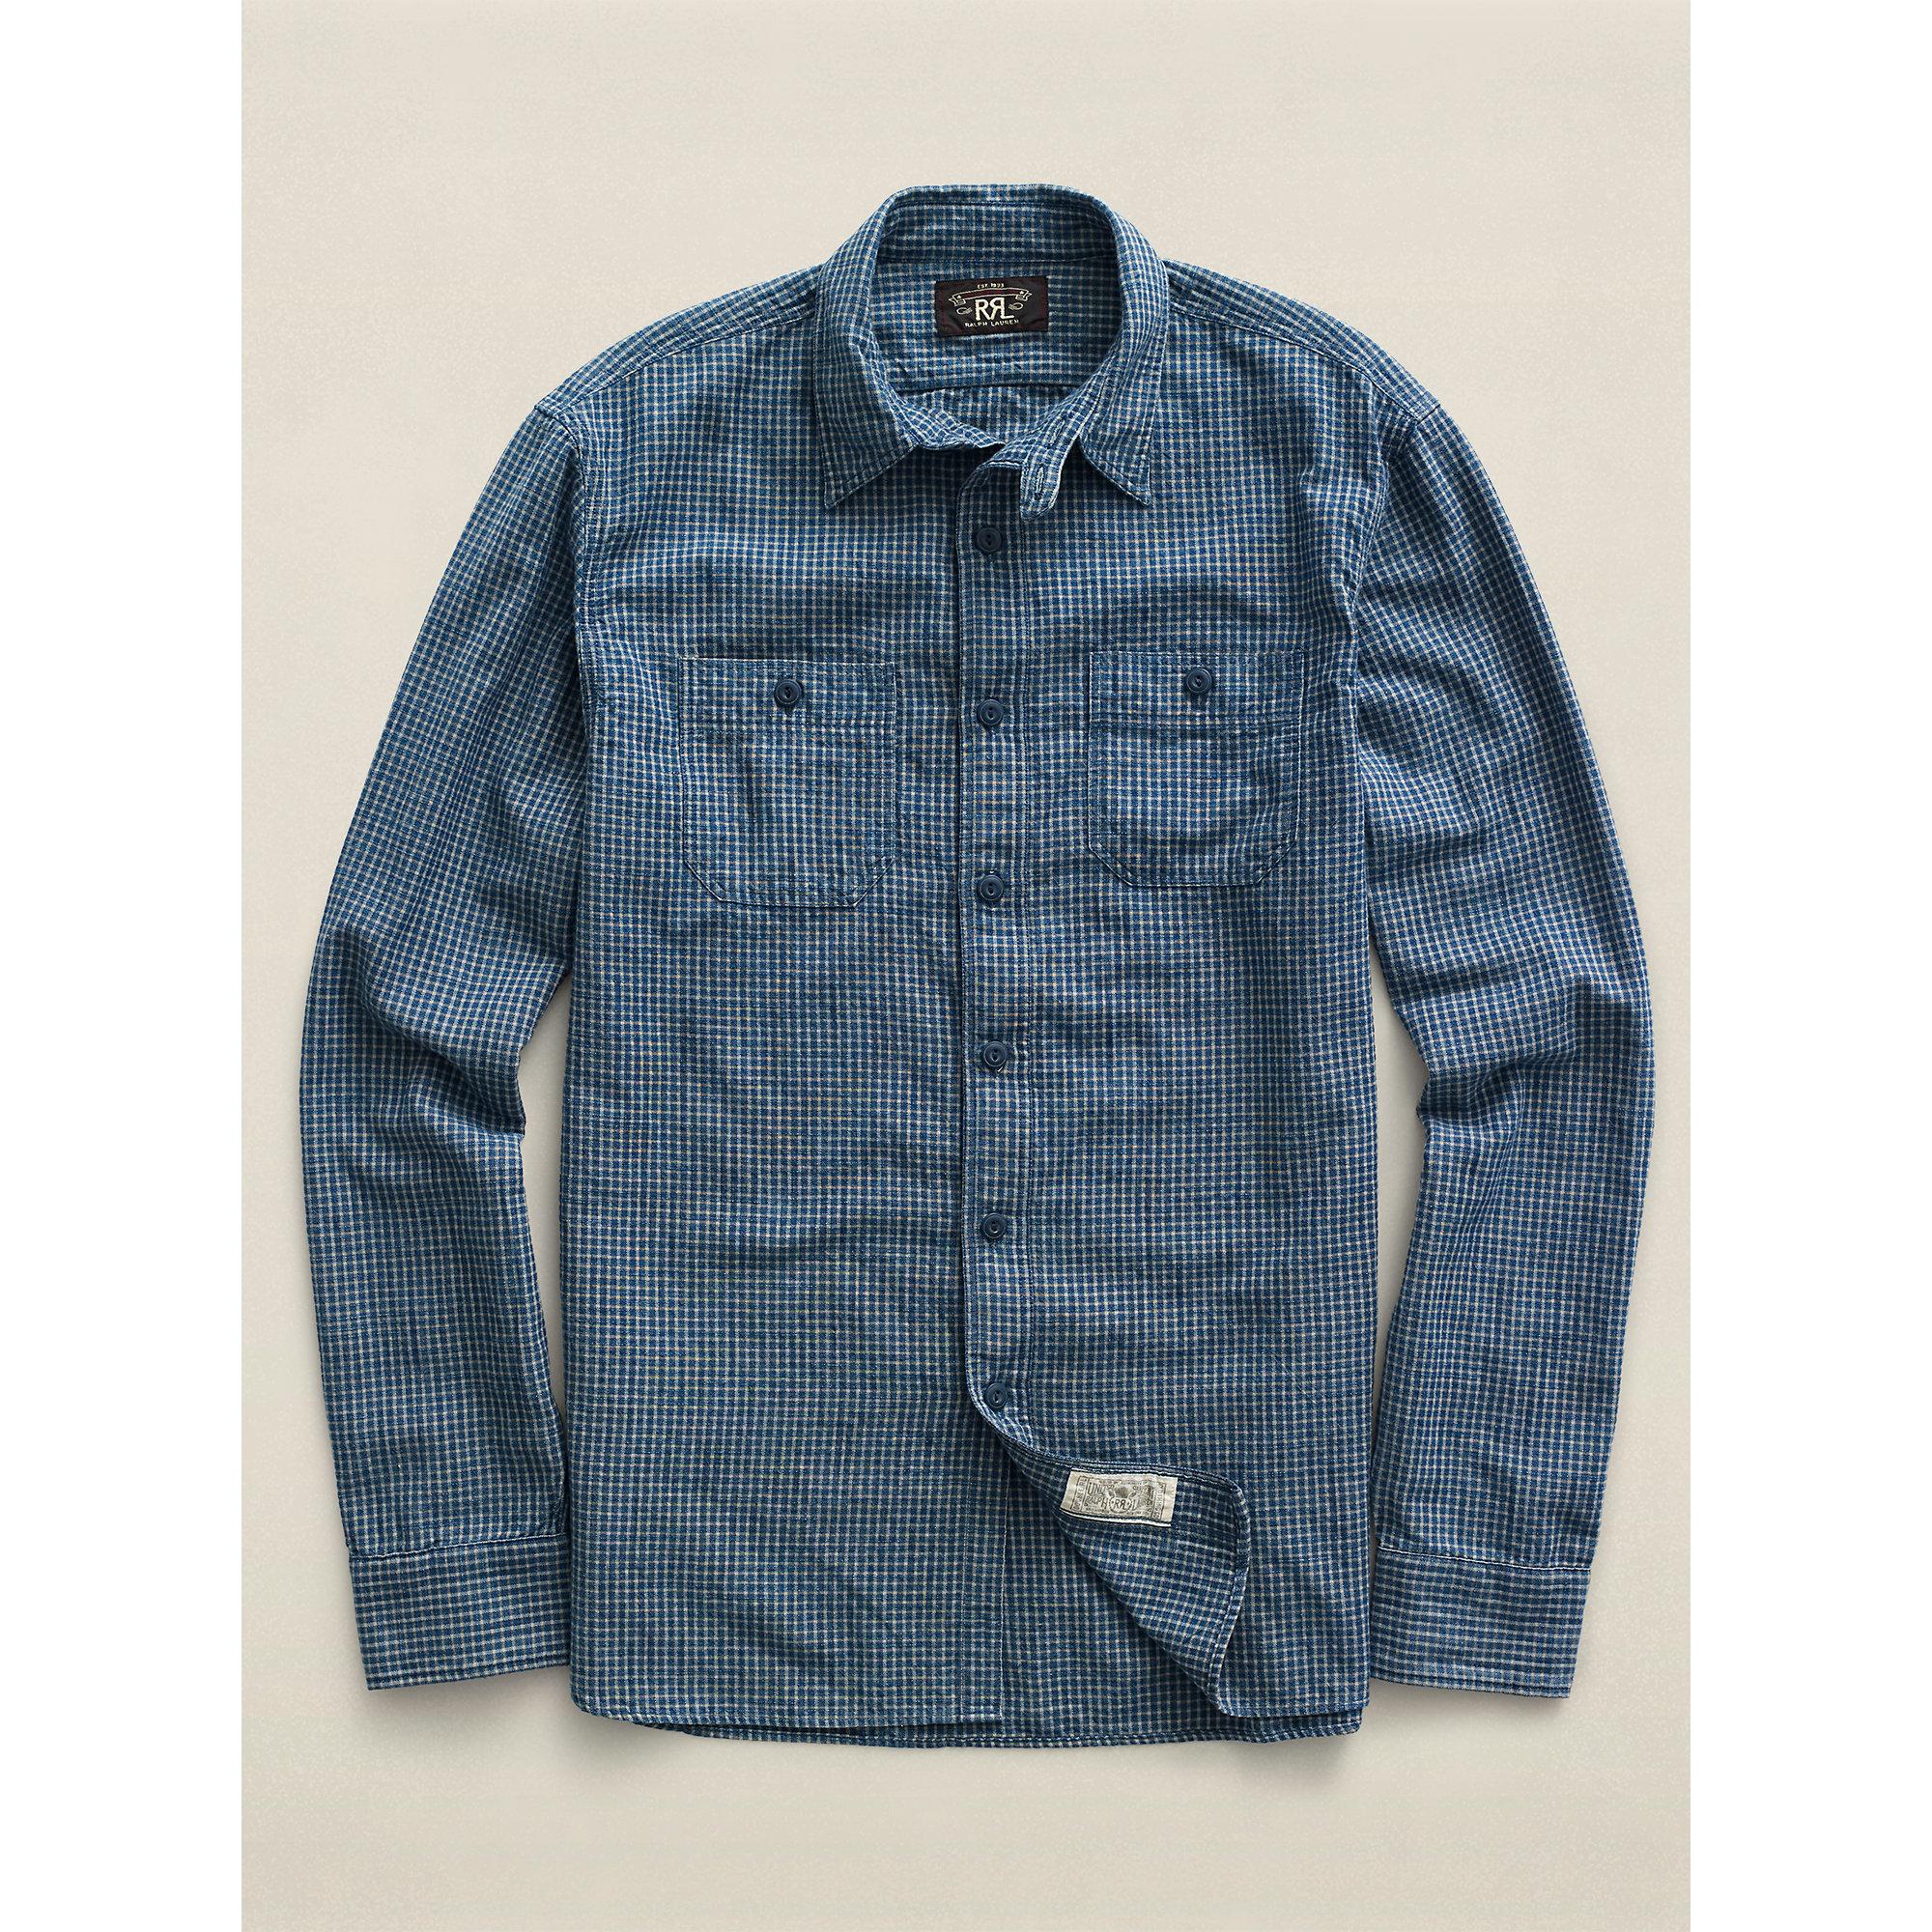 Rrl ideal indigo cotton workshirt in blue for men lyst for Blue cotton work shirts